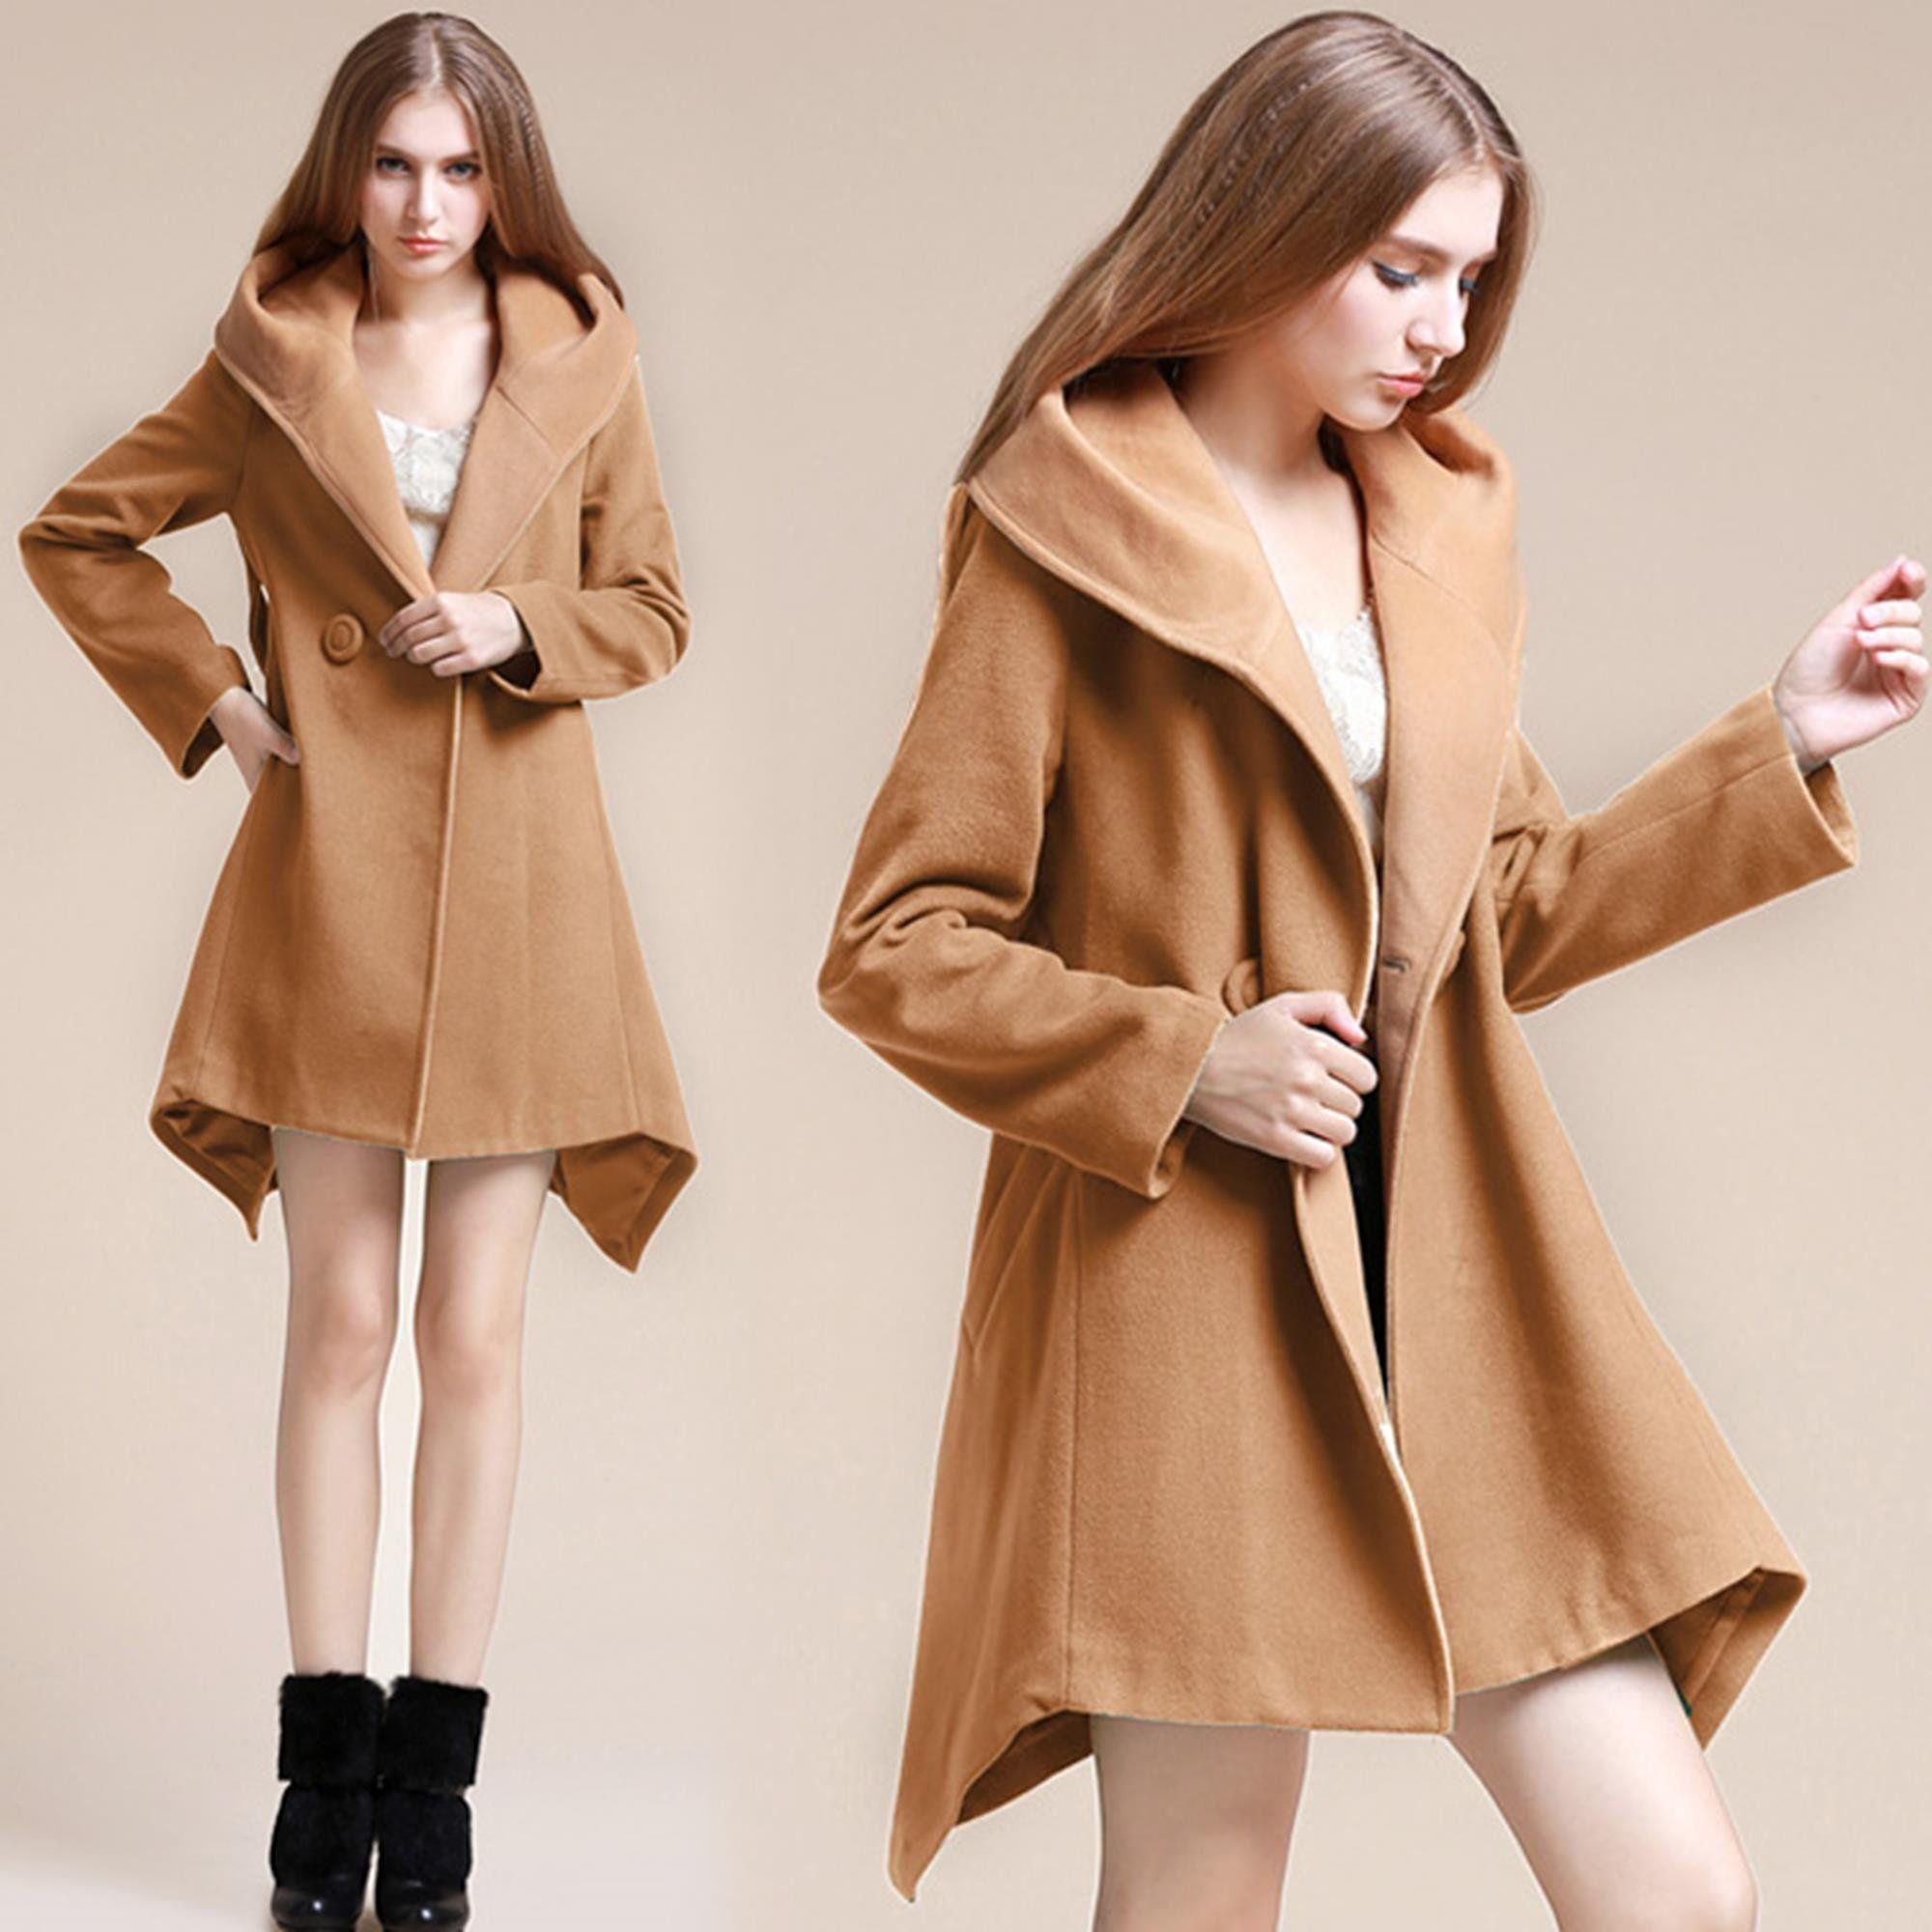 FINEJO 2014 New Fashion Irregular Lapel Trench Wool Blend Double Breasted Coat Jacket at Amazon Women's Coats Shop  http://www.amazon.com/FINEJO-Sleeve-Irregular-Draped-Blouse/dp/B00PIECFI8/ref=sr_1_145?ie=UTF8&qid=1416504315&sr=8-145&keywords=trench+coat+pattern